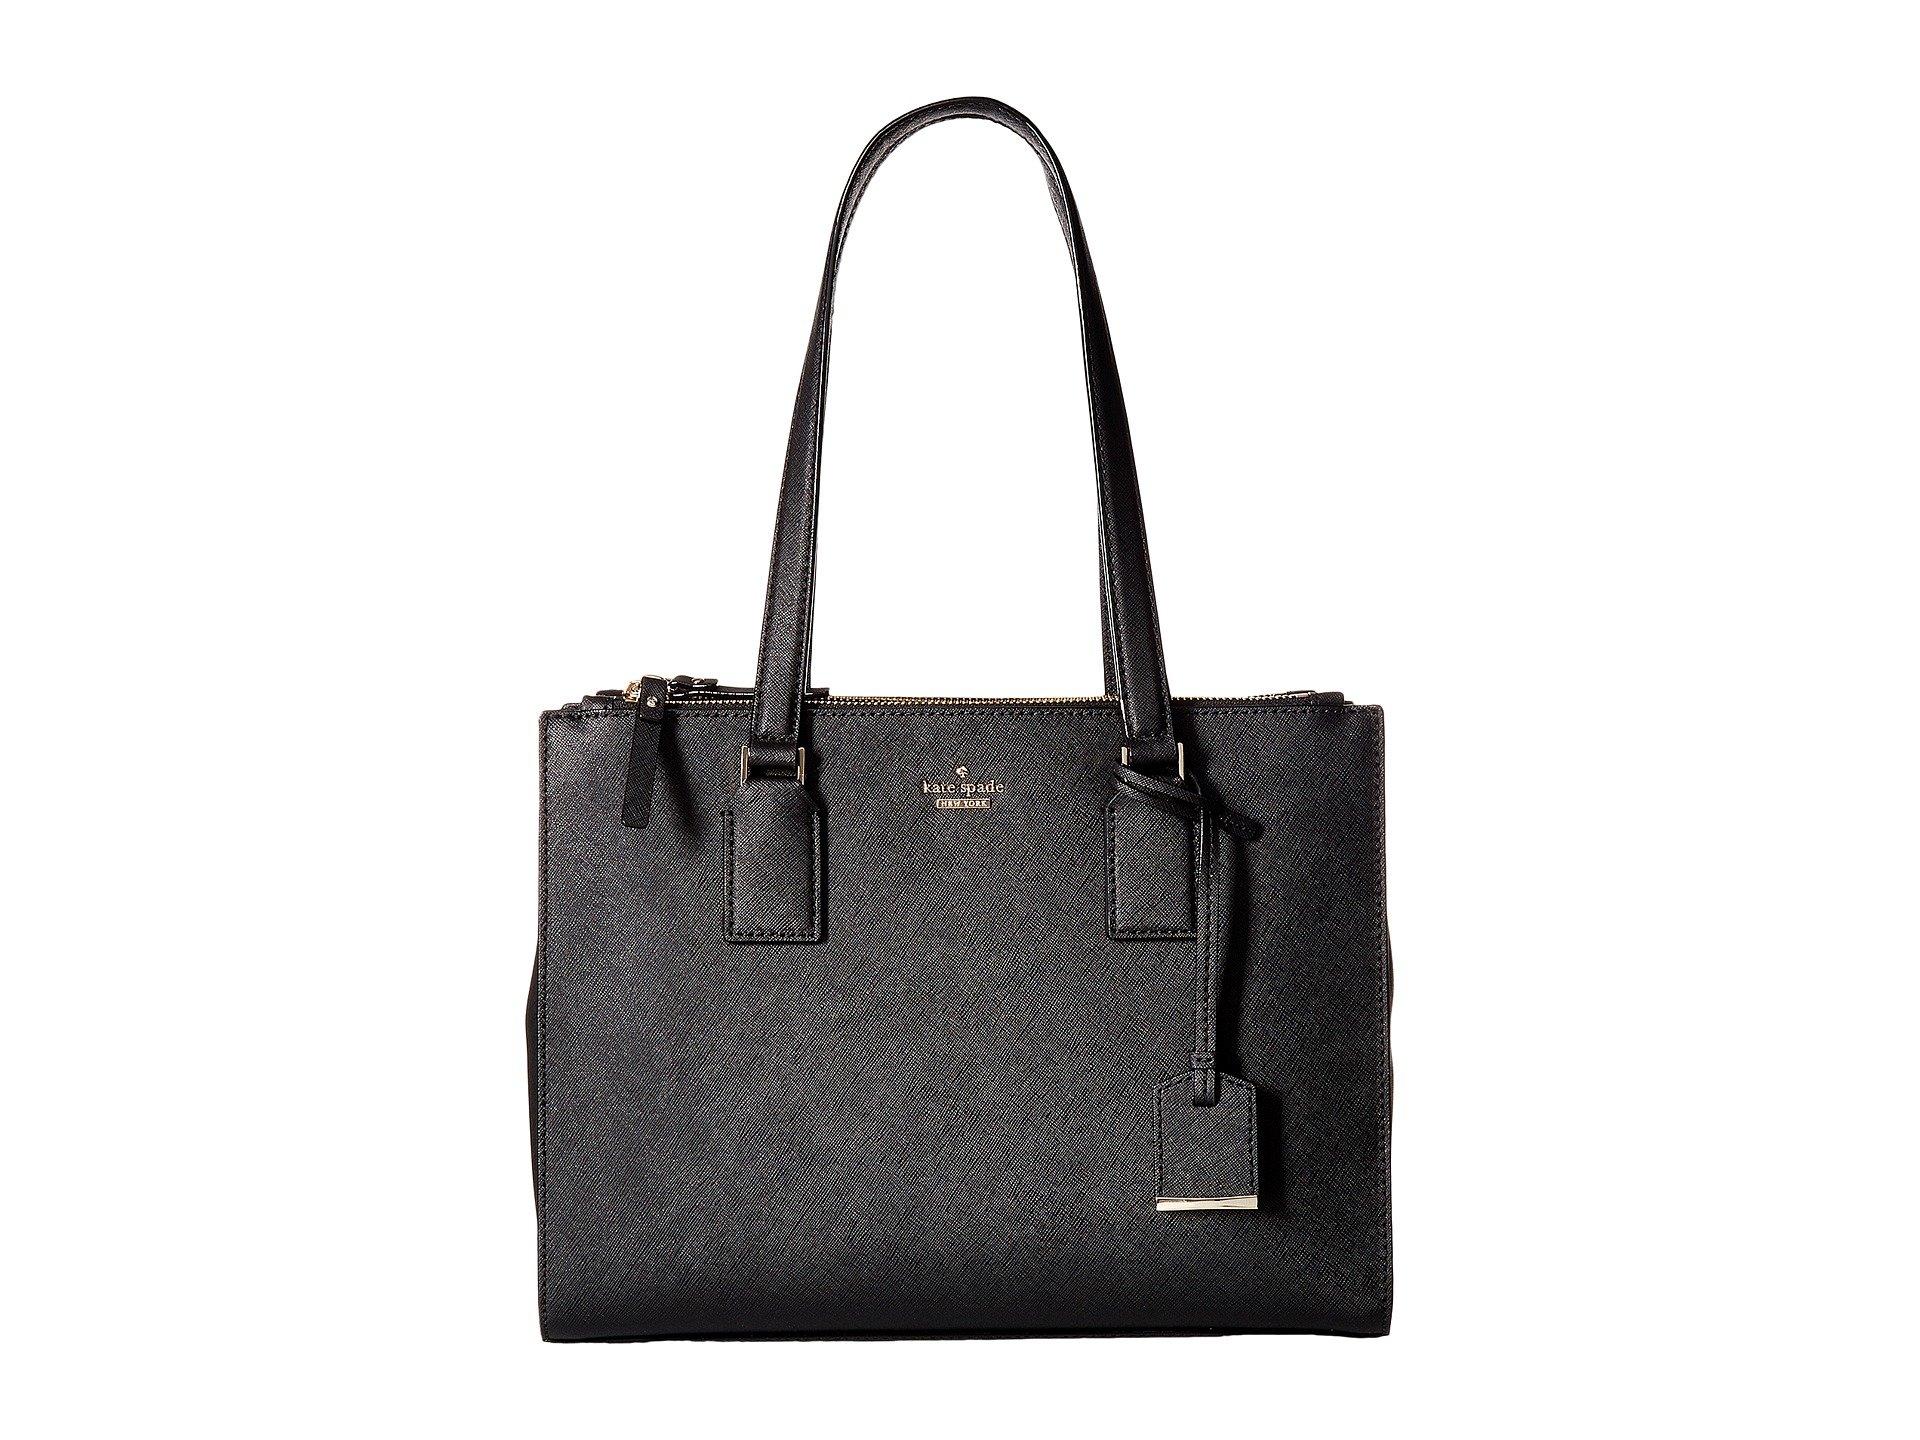 New Kate Spade New York Cameron Street Small Jensen Handbags, Black